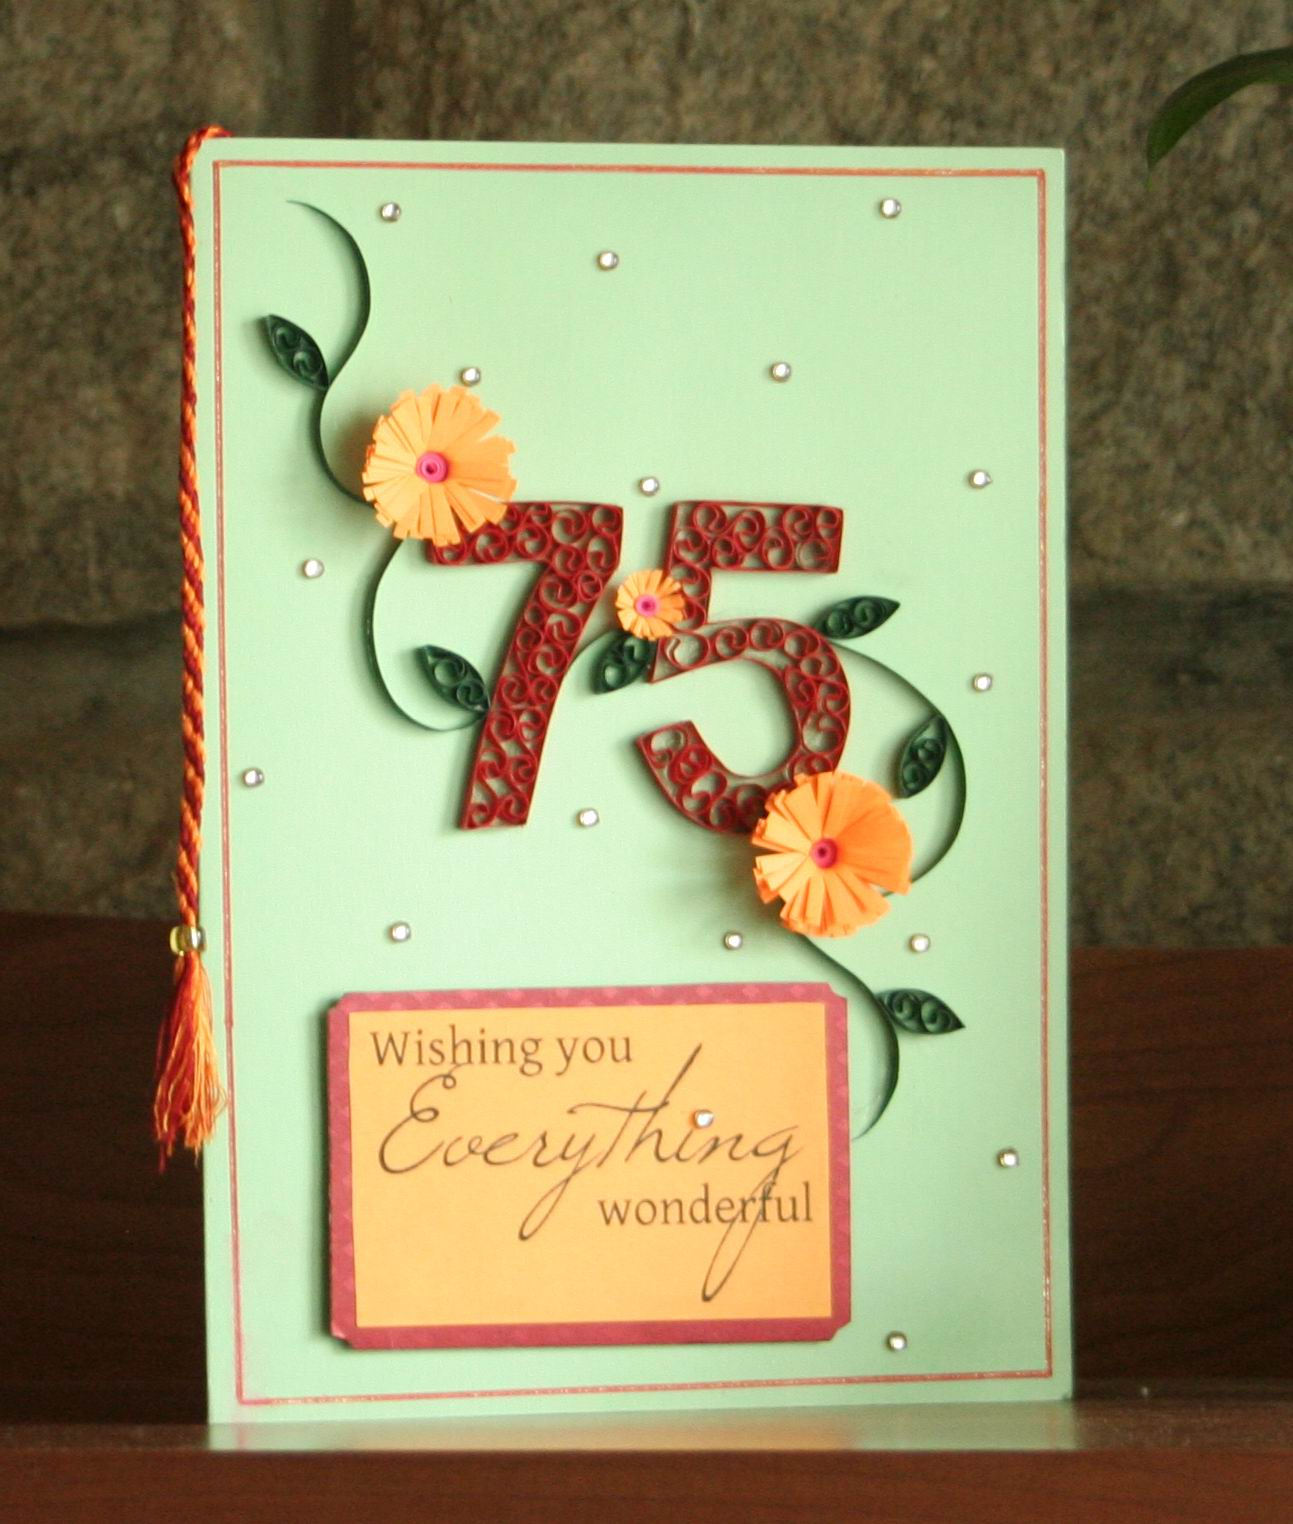 My Handmade cards: 75th Birthday!